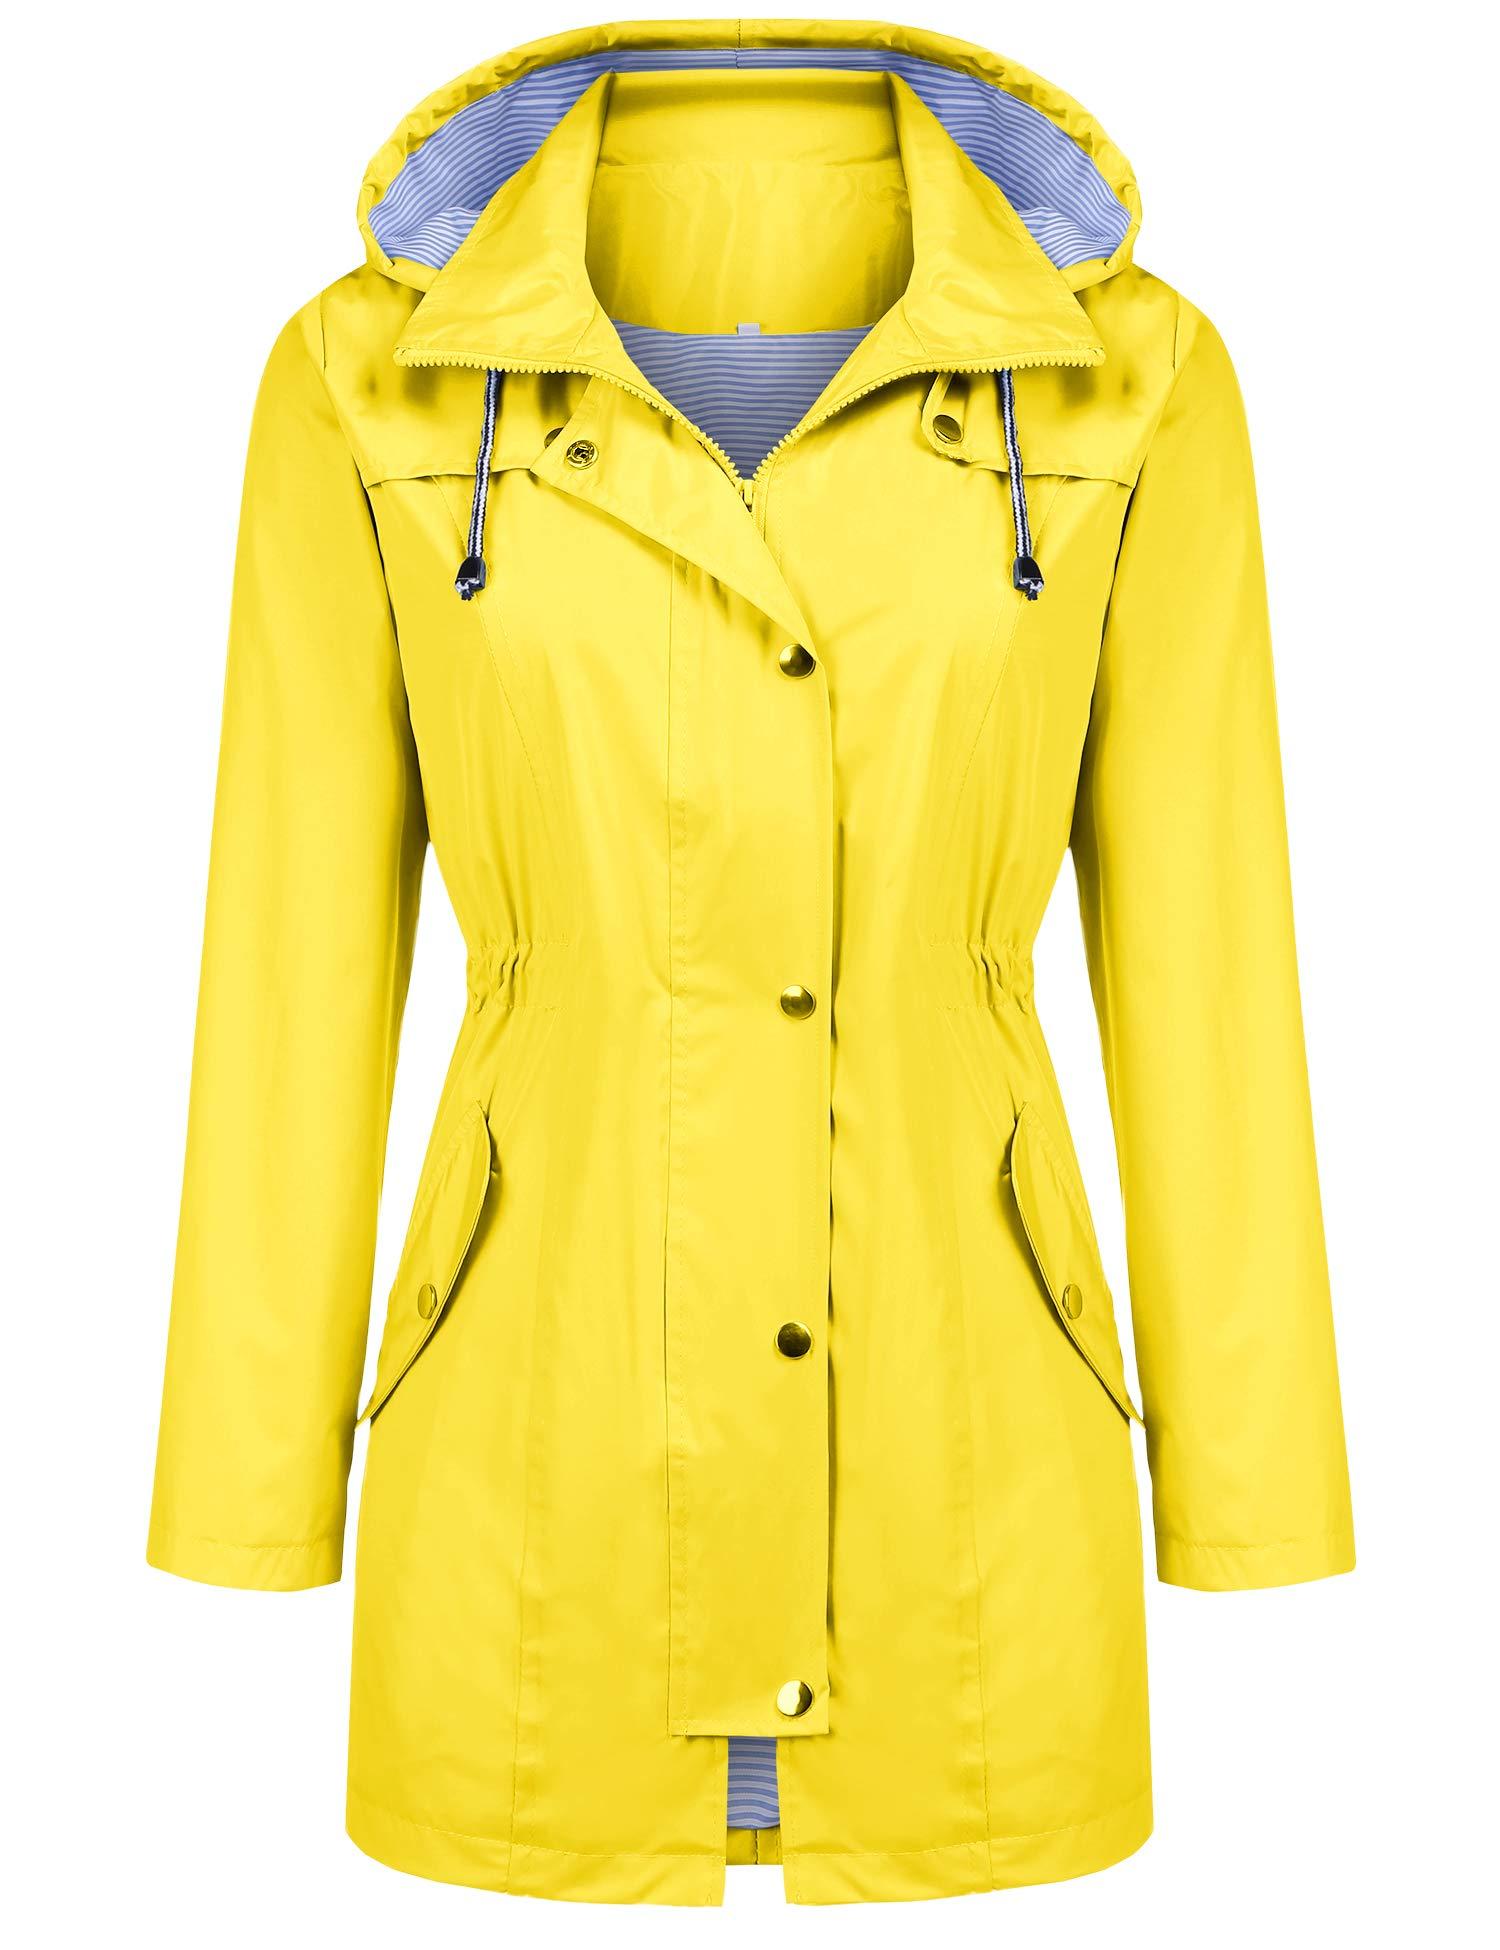 Kikibell Camping Jacket Womens Lightweight Hooded Waterproof Active Outdoor Rain Jacket Yellow M by Kikibell